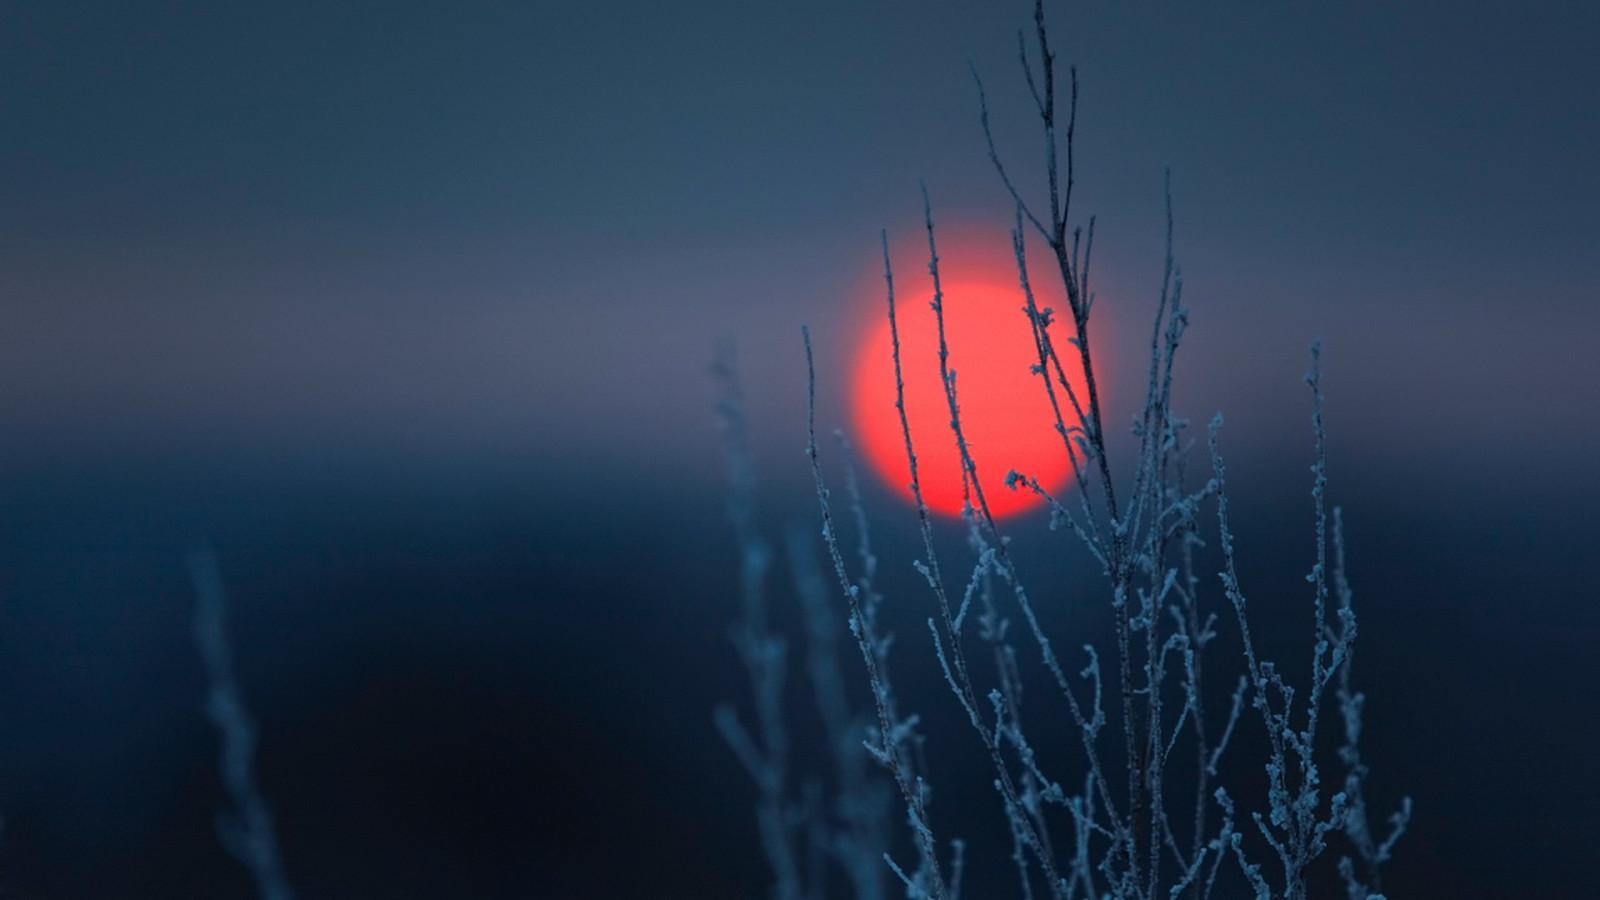 Sunlight Landscape Sunset Nature Minimalism Reflection Sky Plants Winter Branch Blue Frost Simple Sun Clear